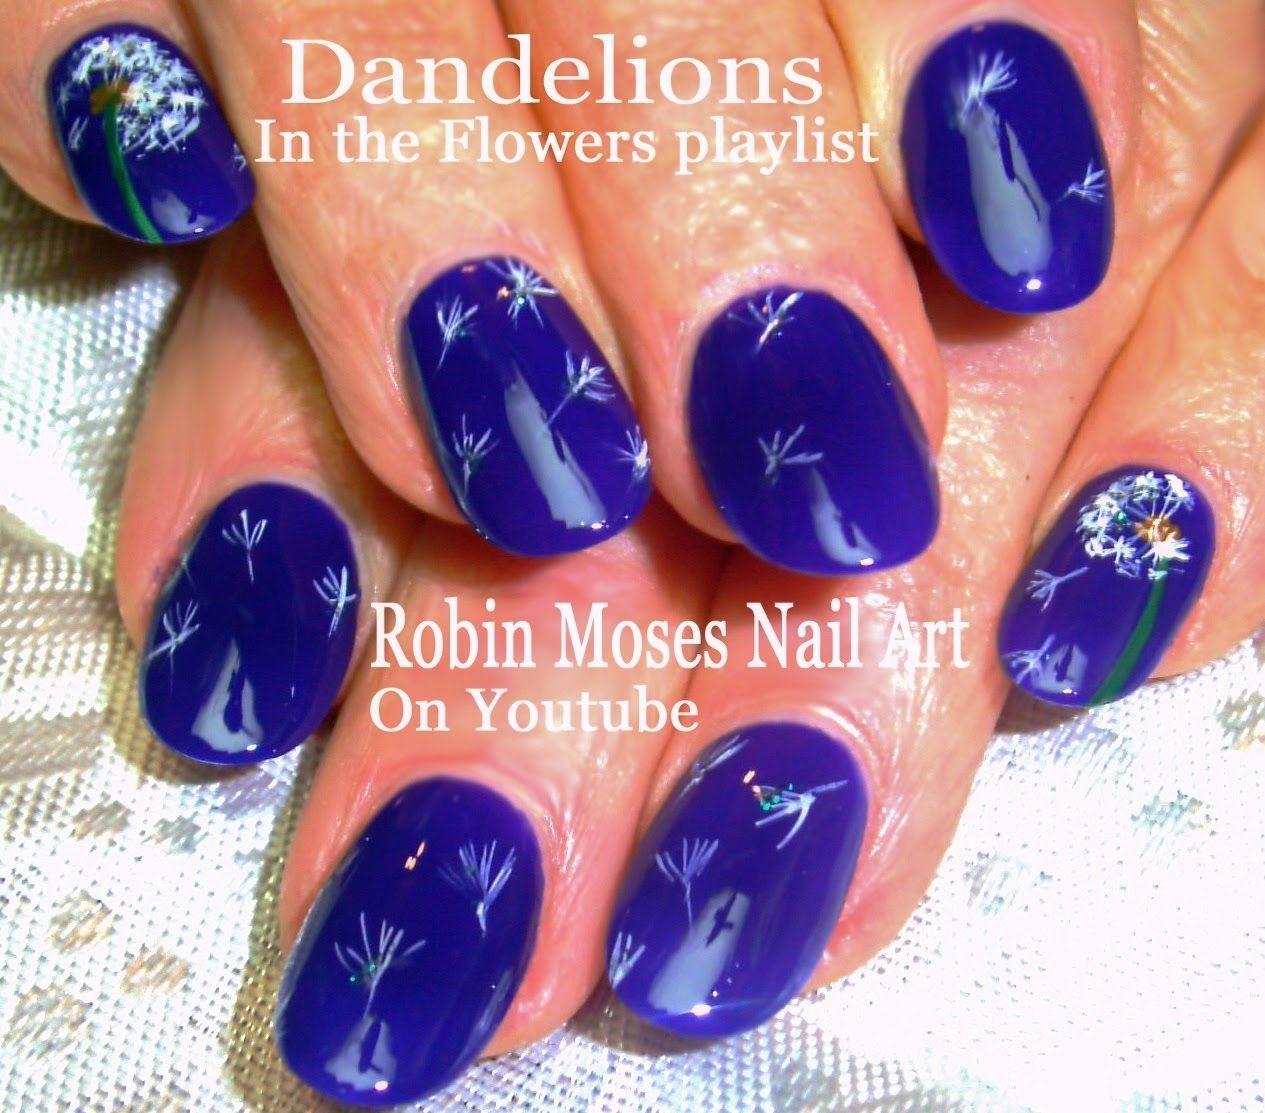 Nail Art Tutorial   Easy DIY Dandelion Nails   Fun Summer Nail Design - Nail Art Tutorial Easy DIY Dandelion Nails Fun Summer Nail